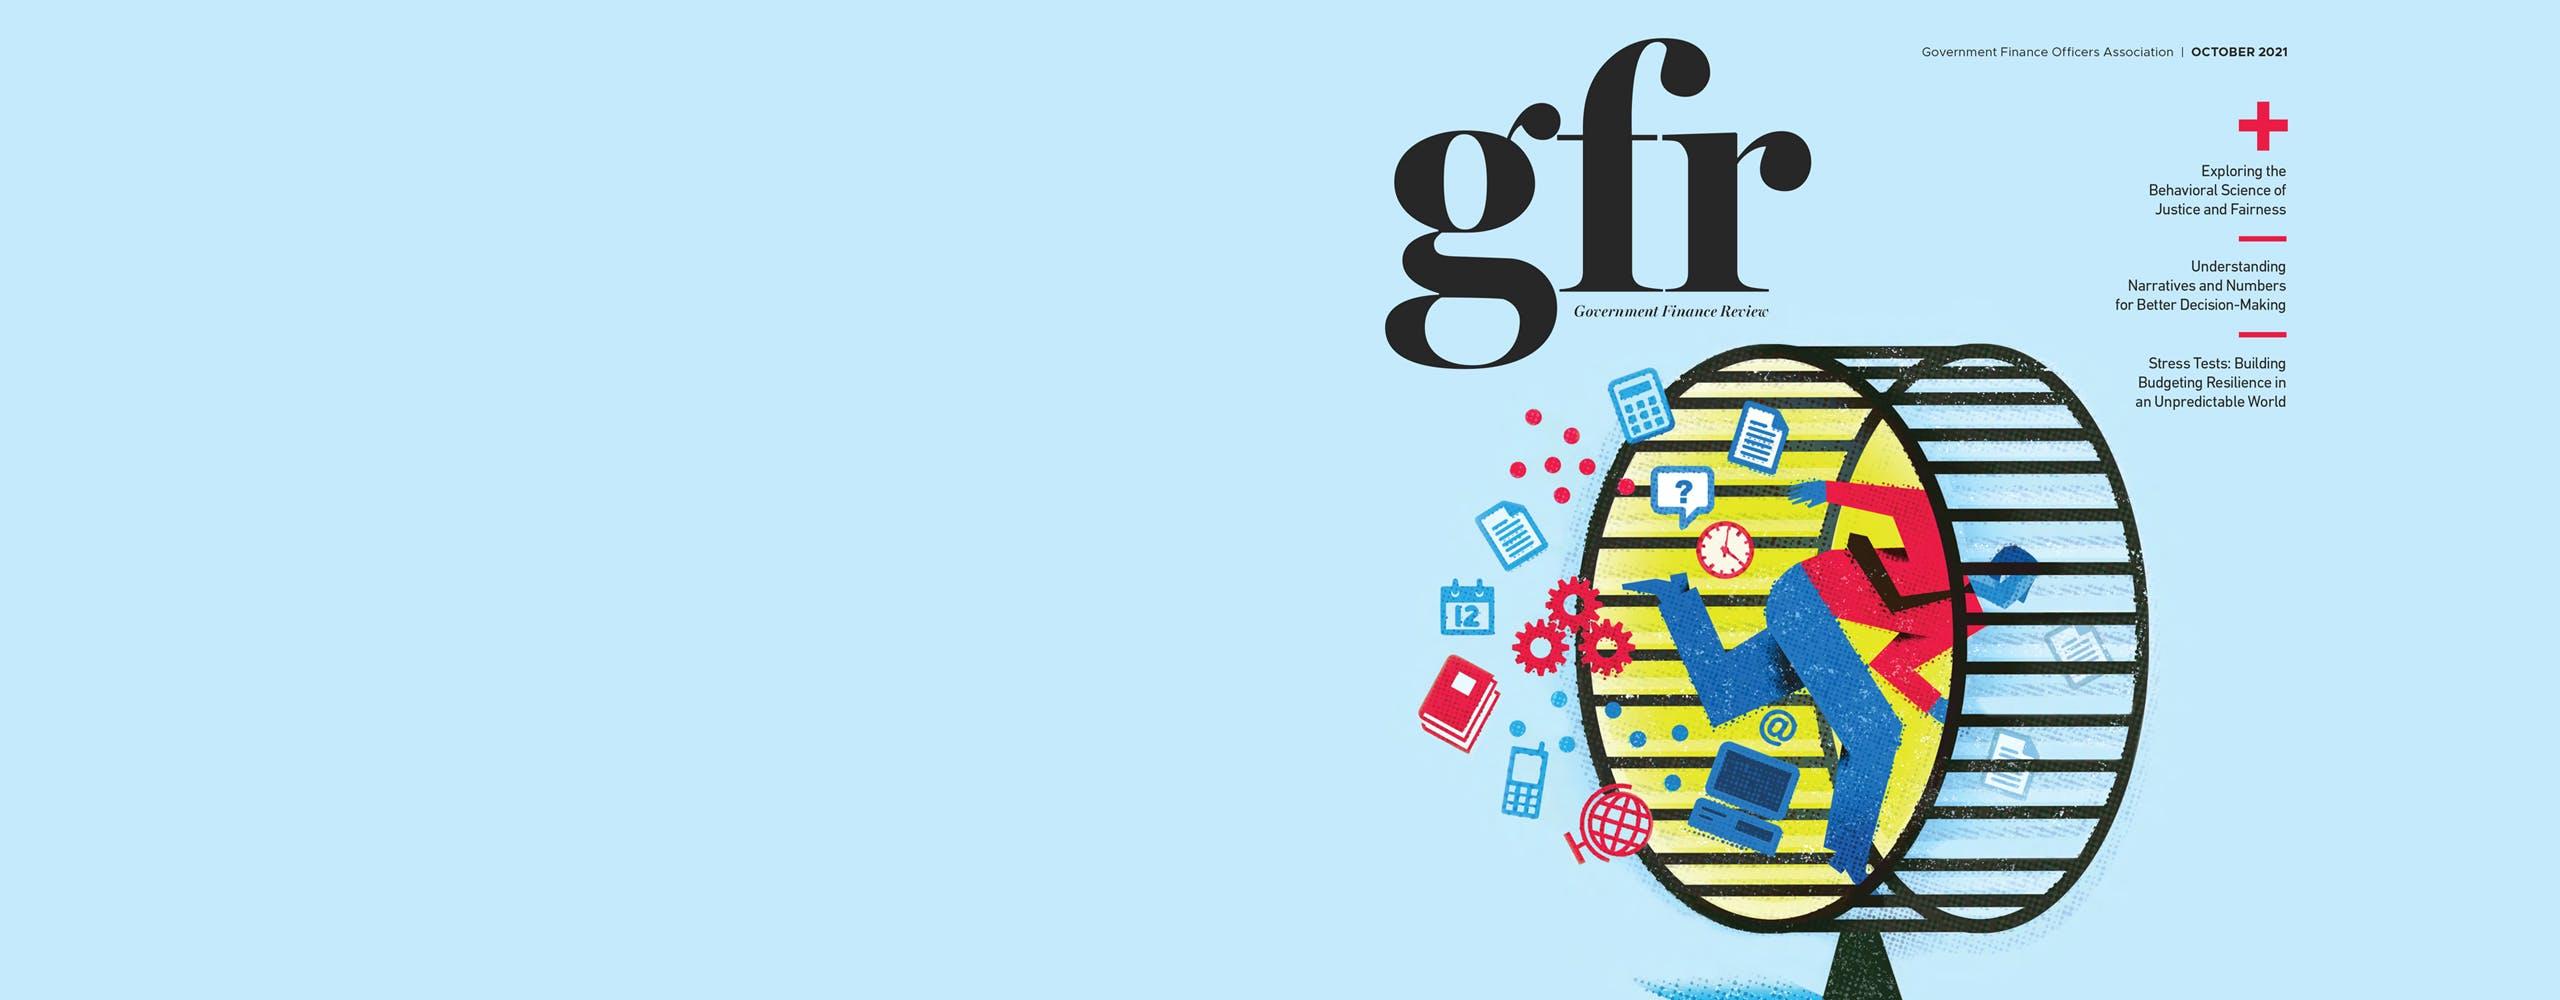 GFR Cover